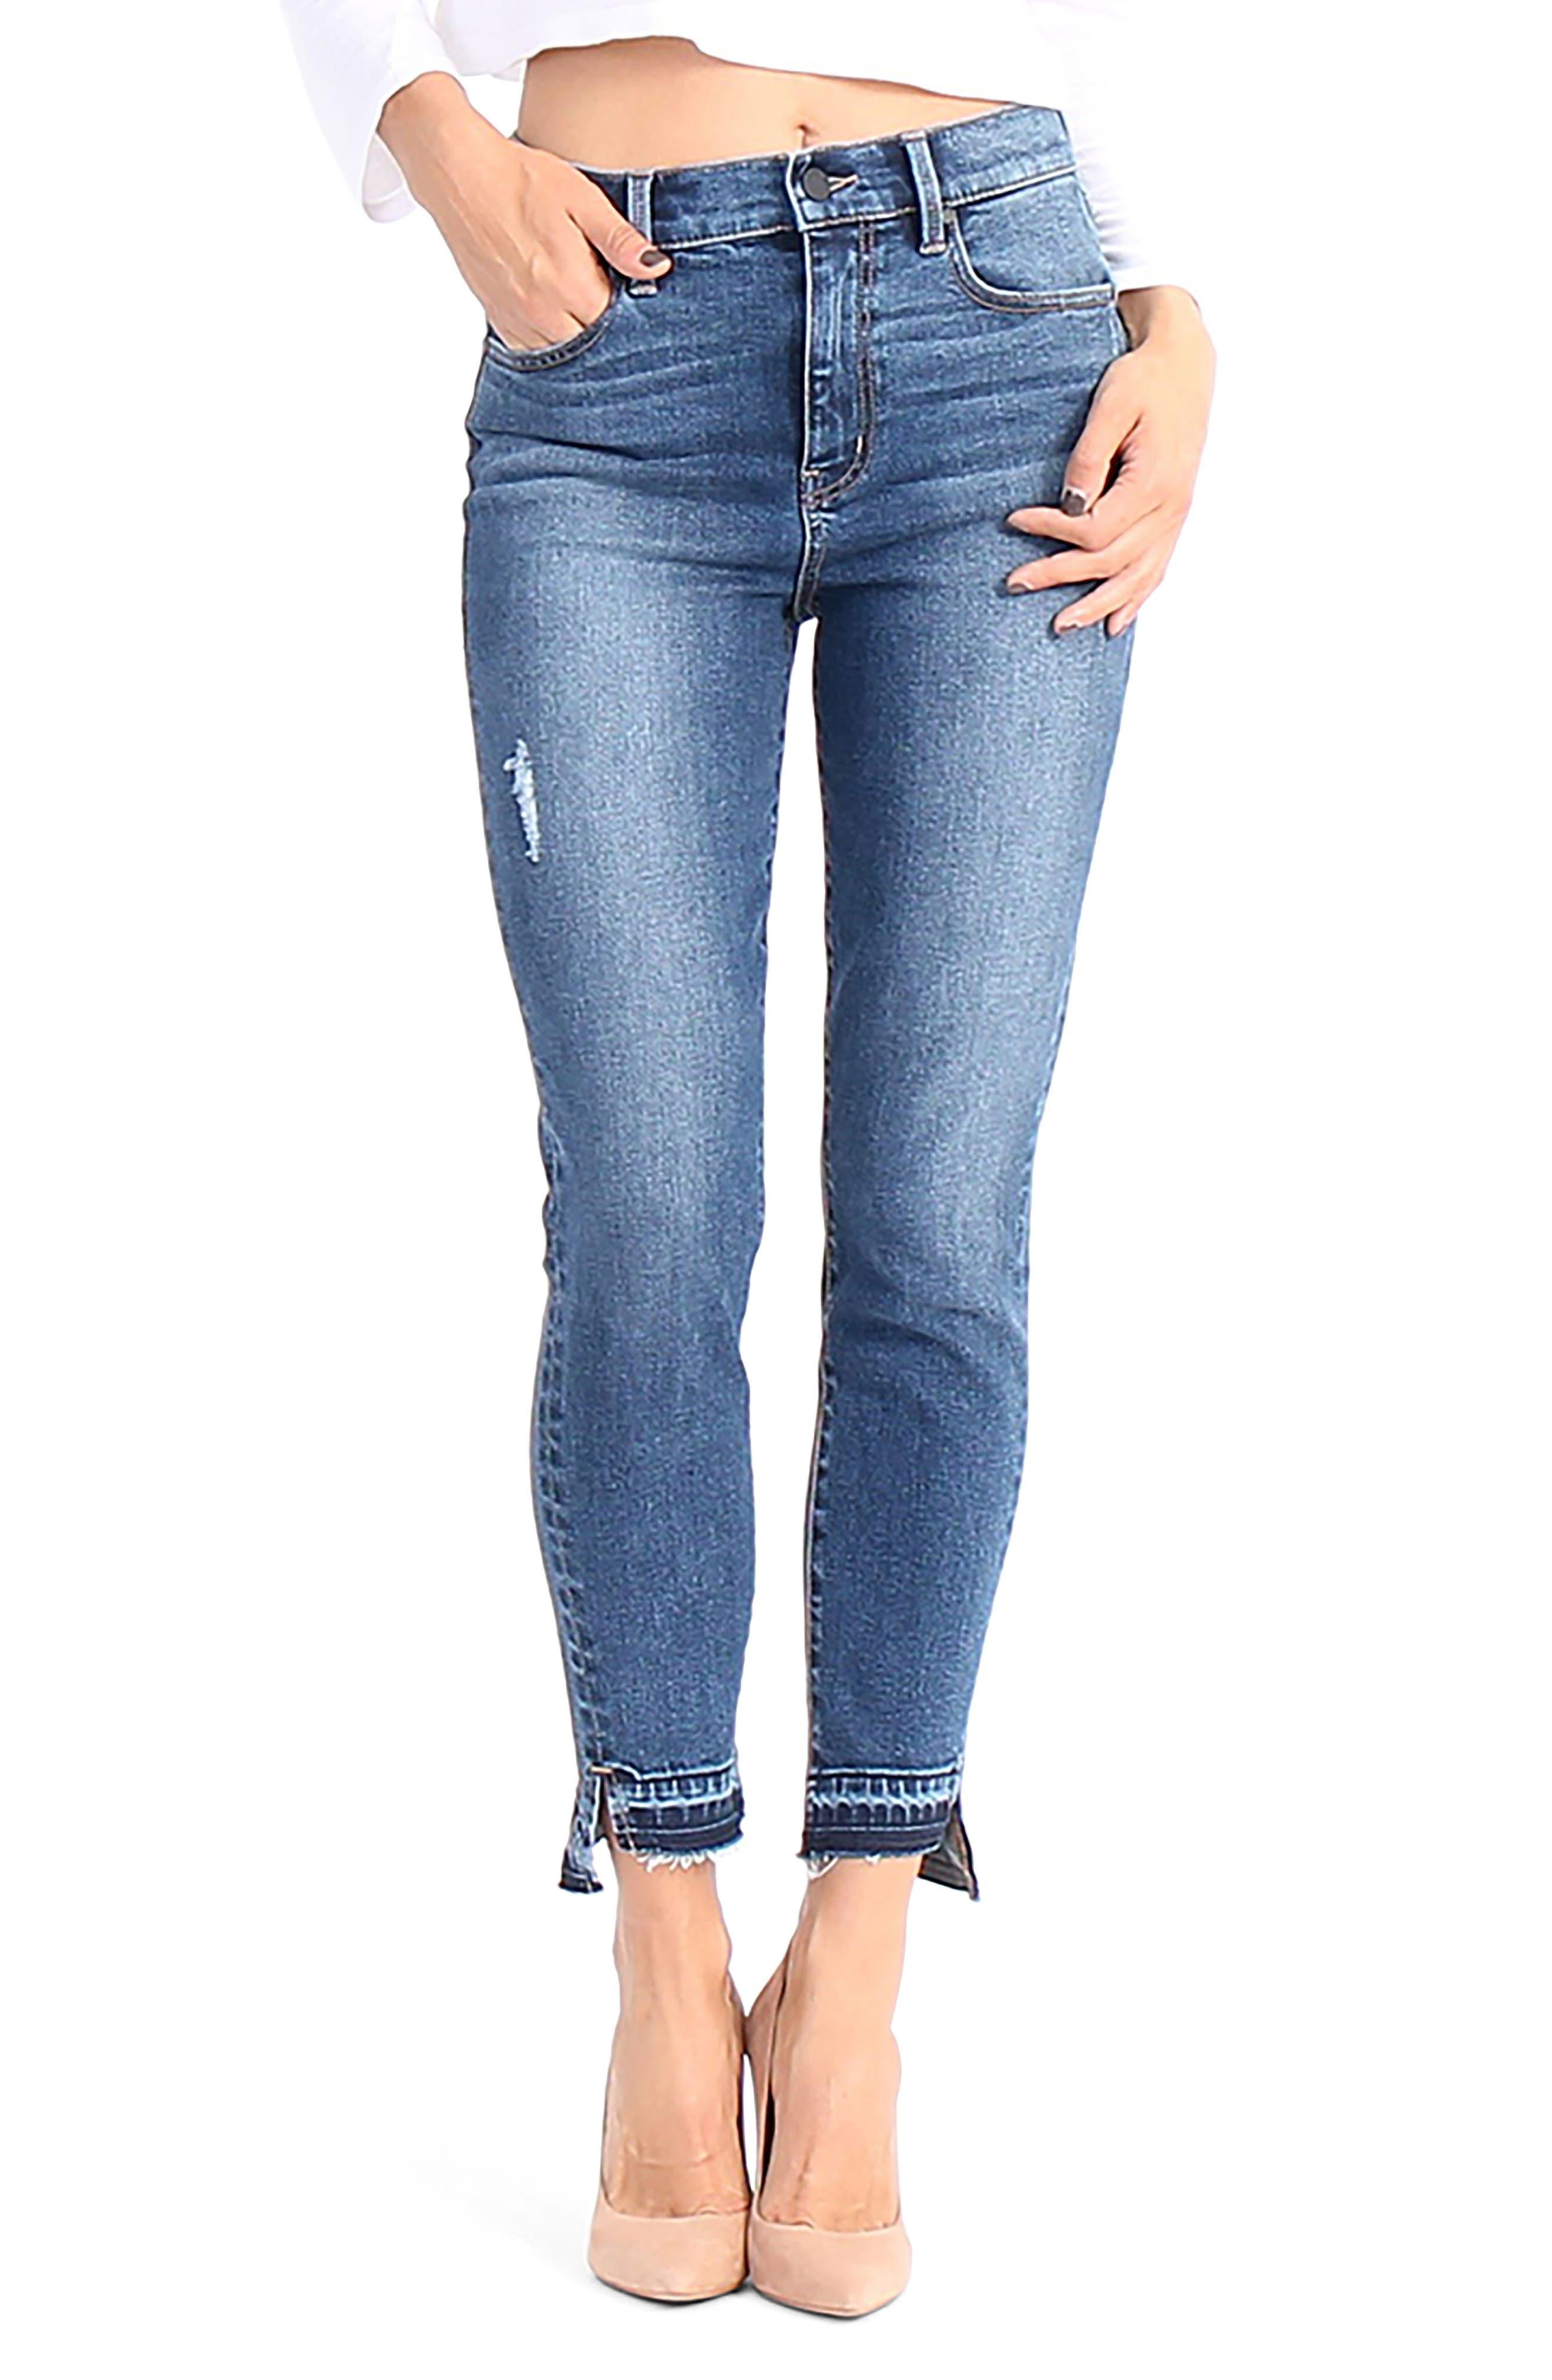 Elle Uneven Hem Skinny Jeans,                         Main,                         color, After Glow